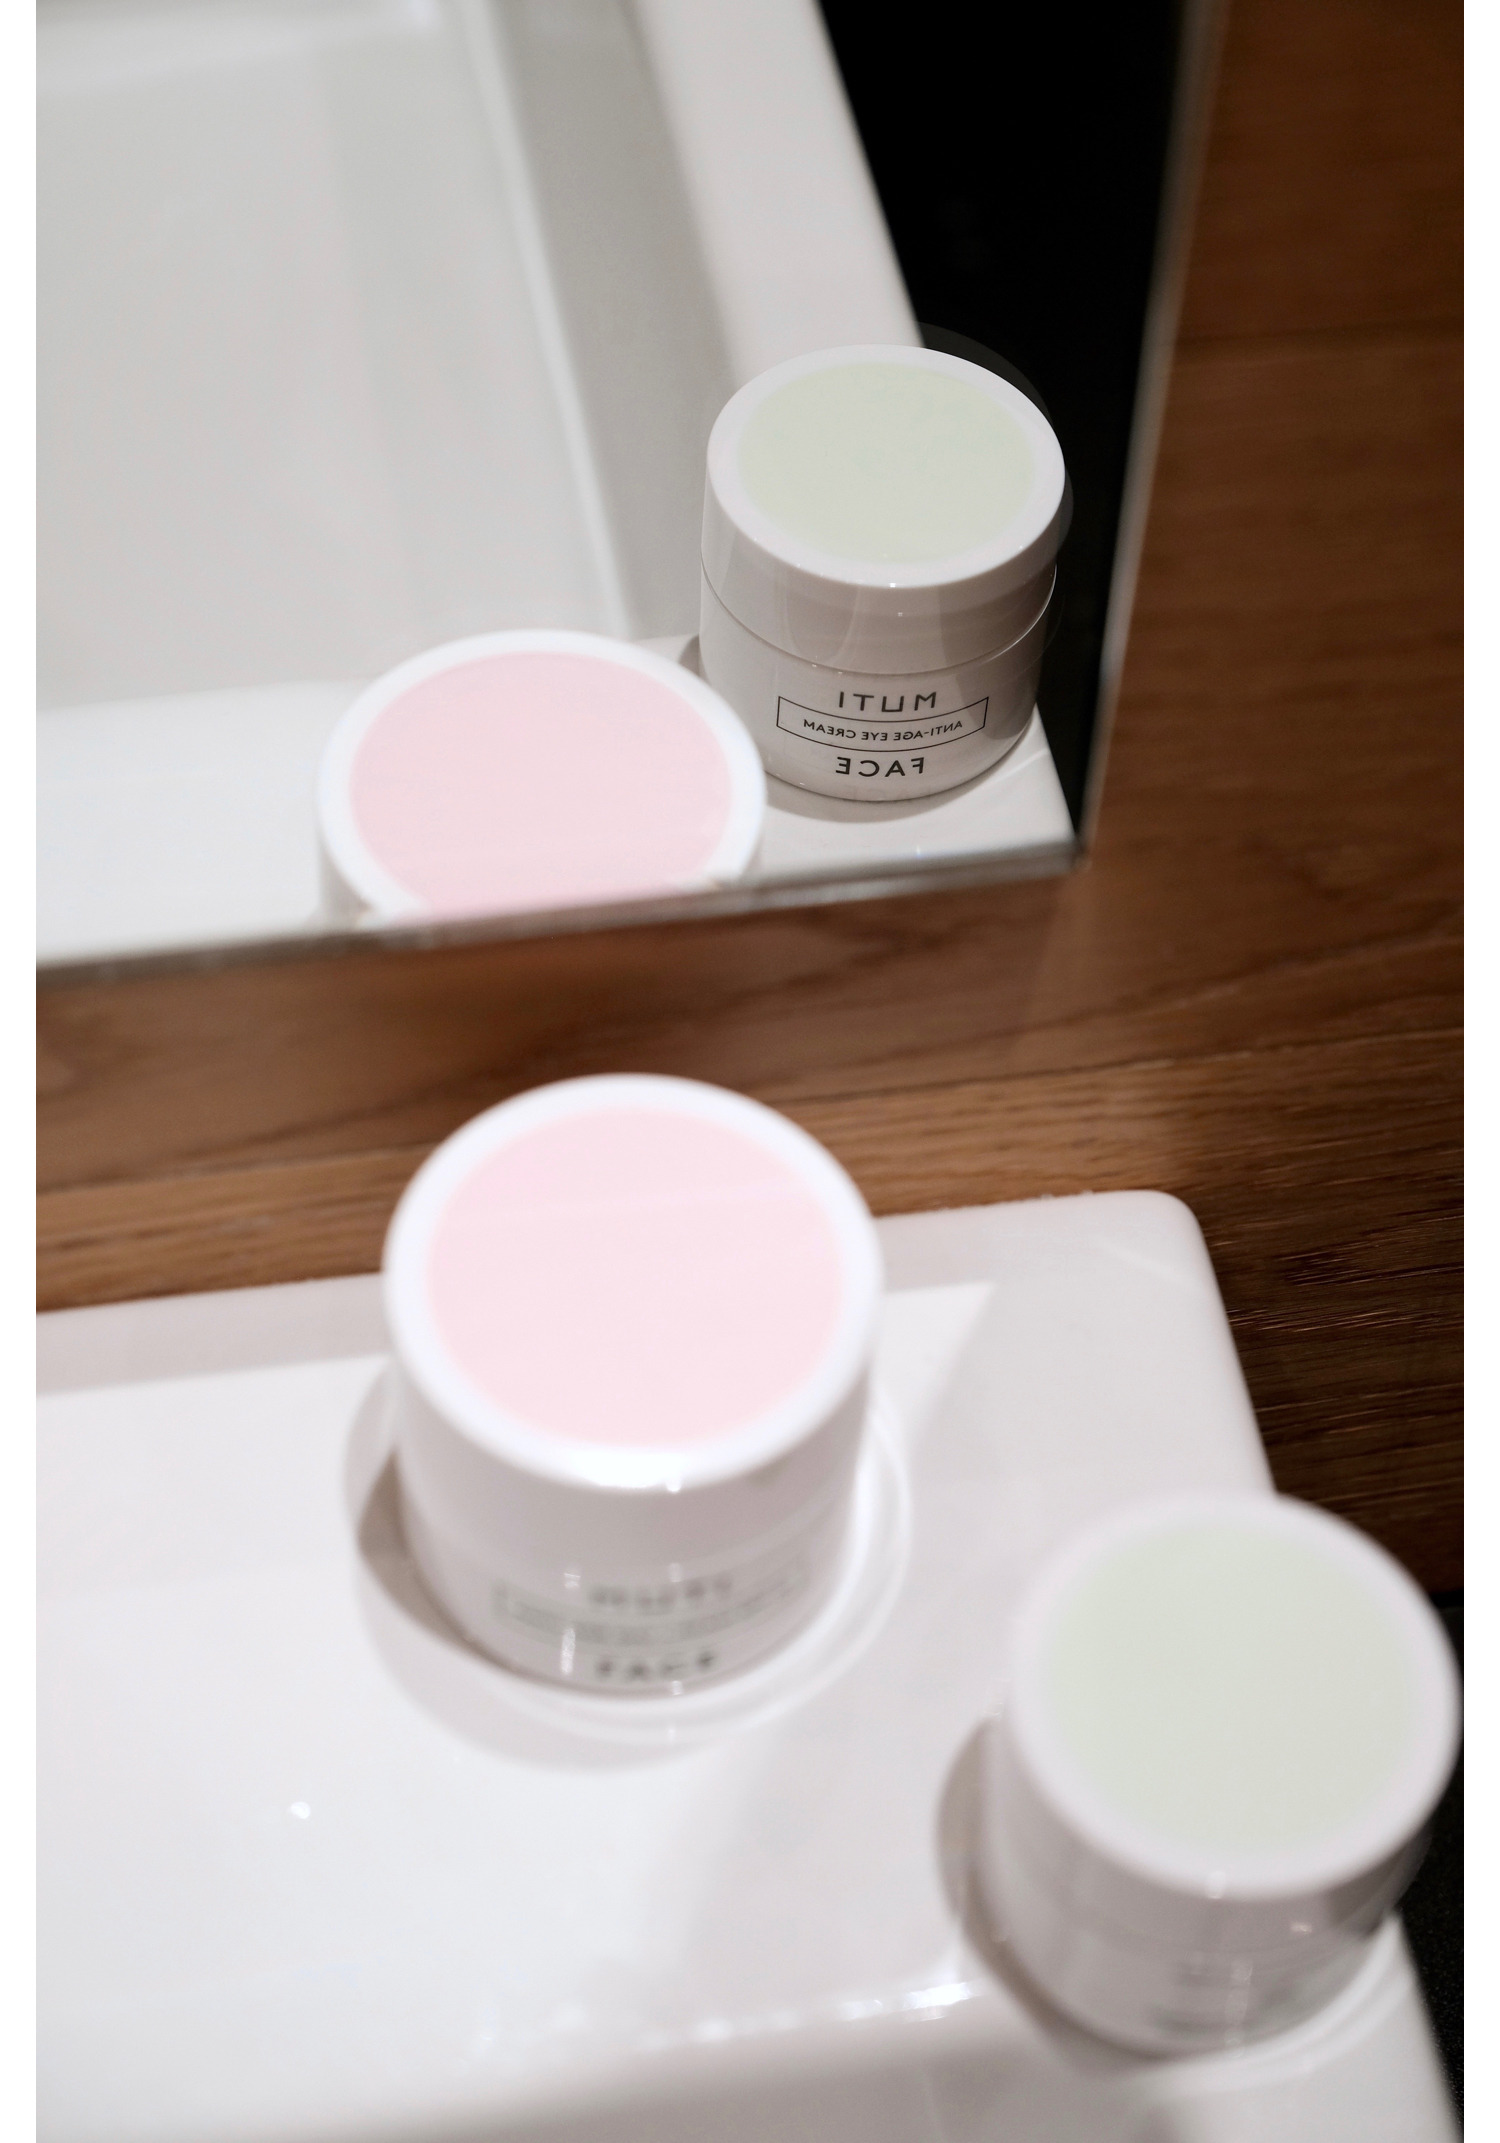 Beautyblog Beautyblogger Elina Neumann Winterpflege für die Haut MUTI Skincare 1